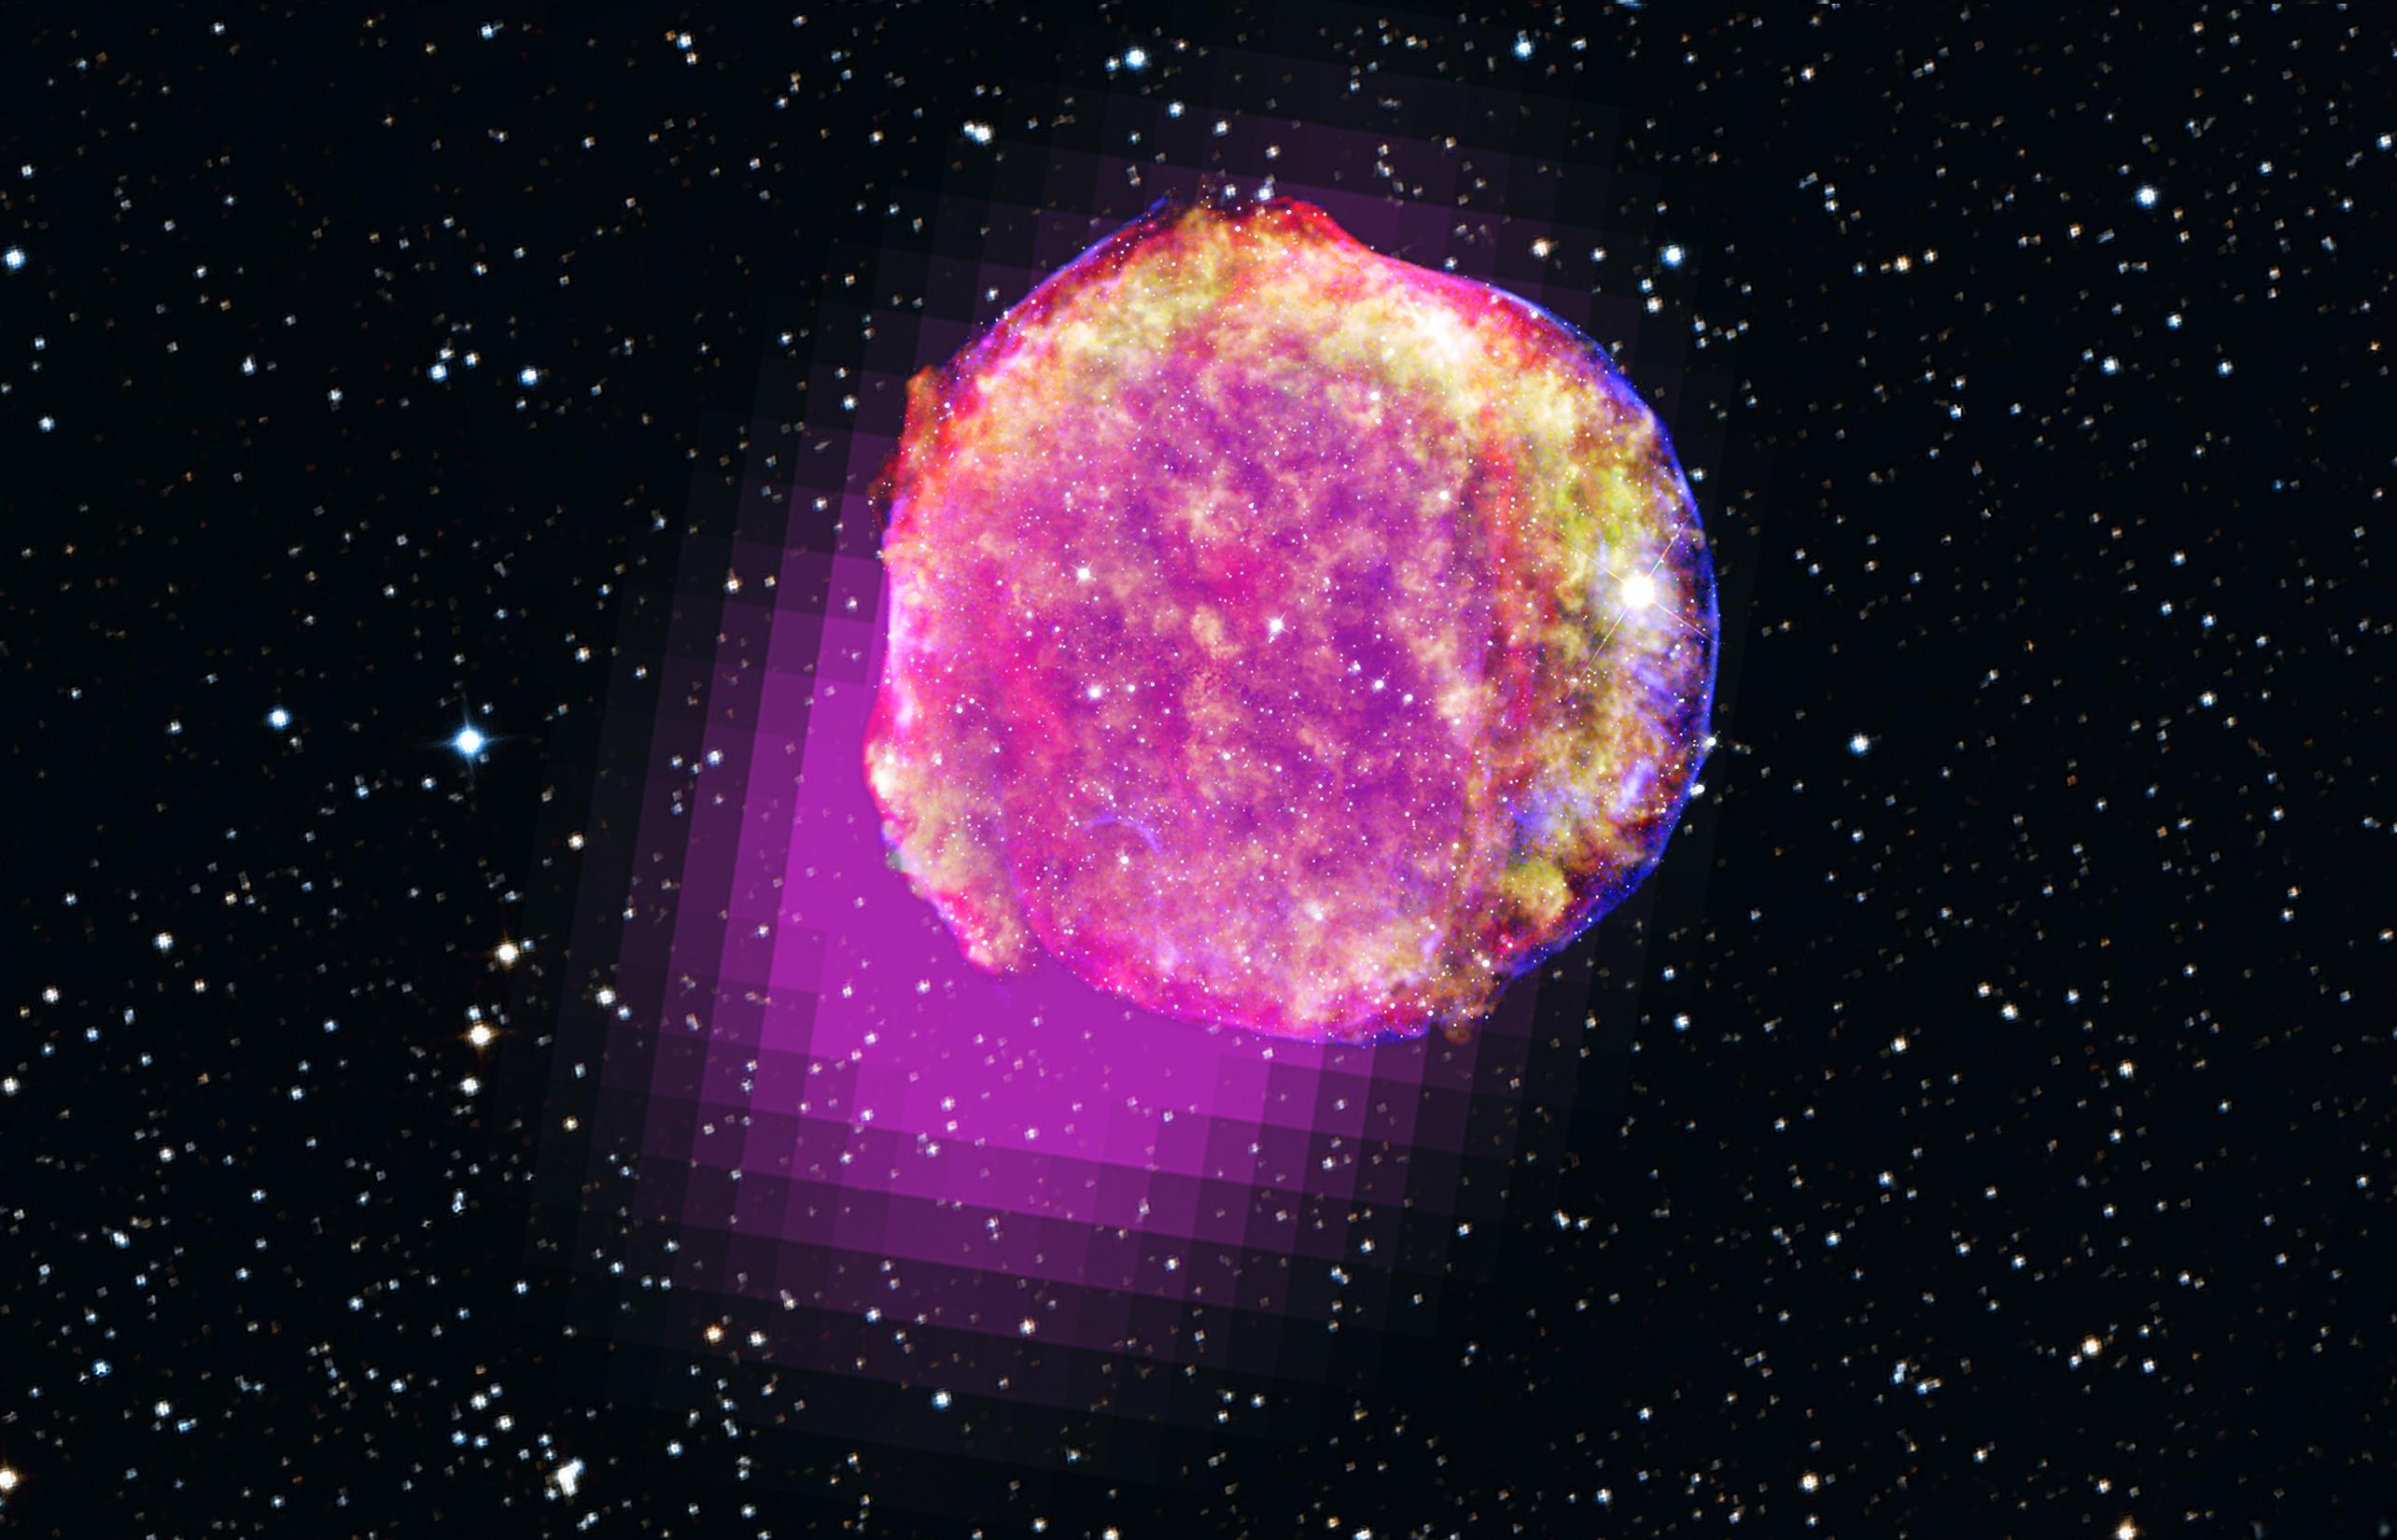 NASA's Fermi Shows That Tycho's Star Shines in Gamma Rays